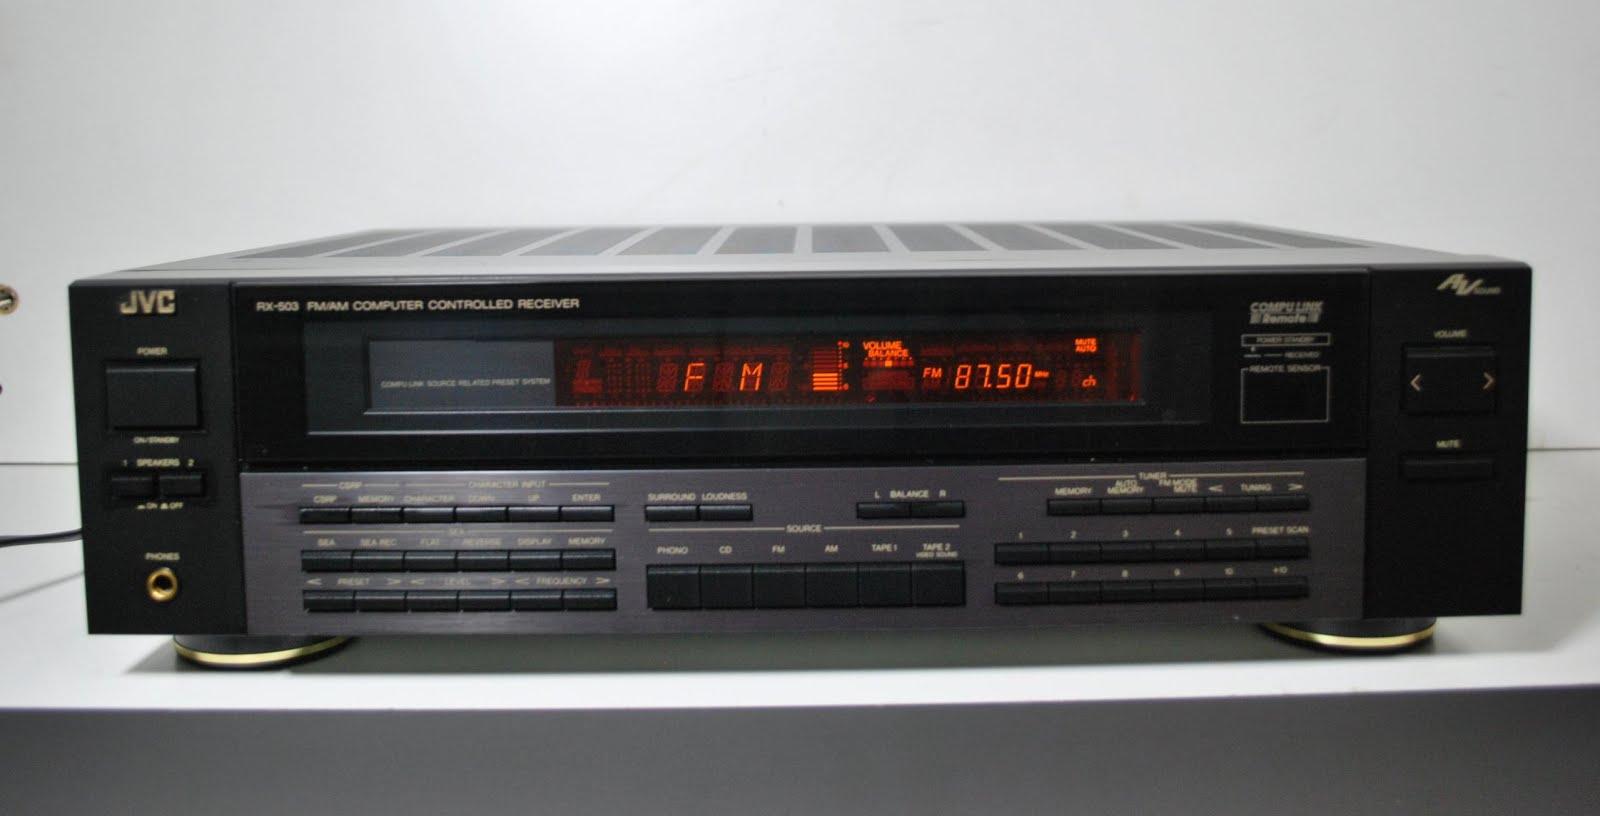 JVC RX-503 - Stereo Receiver